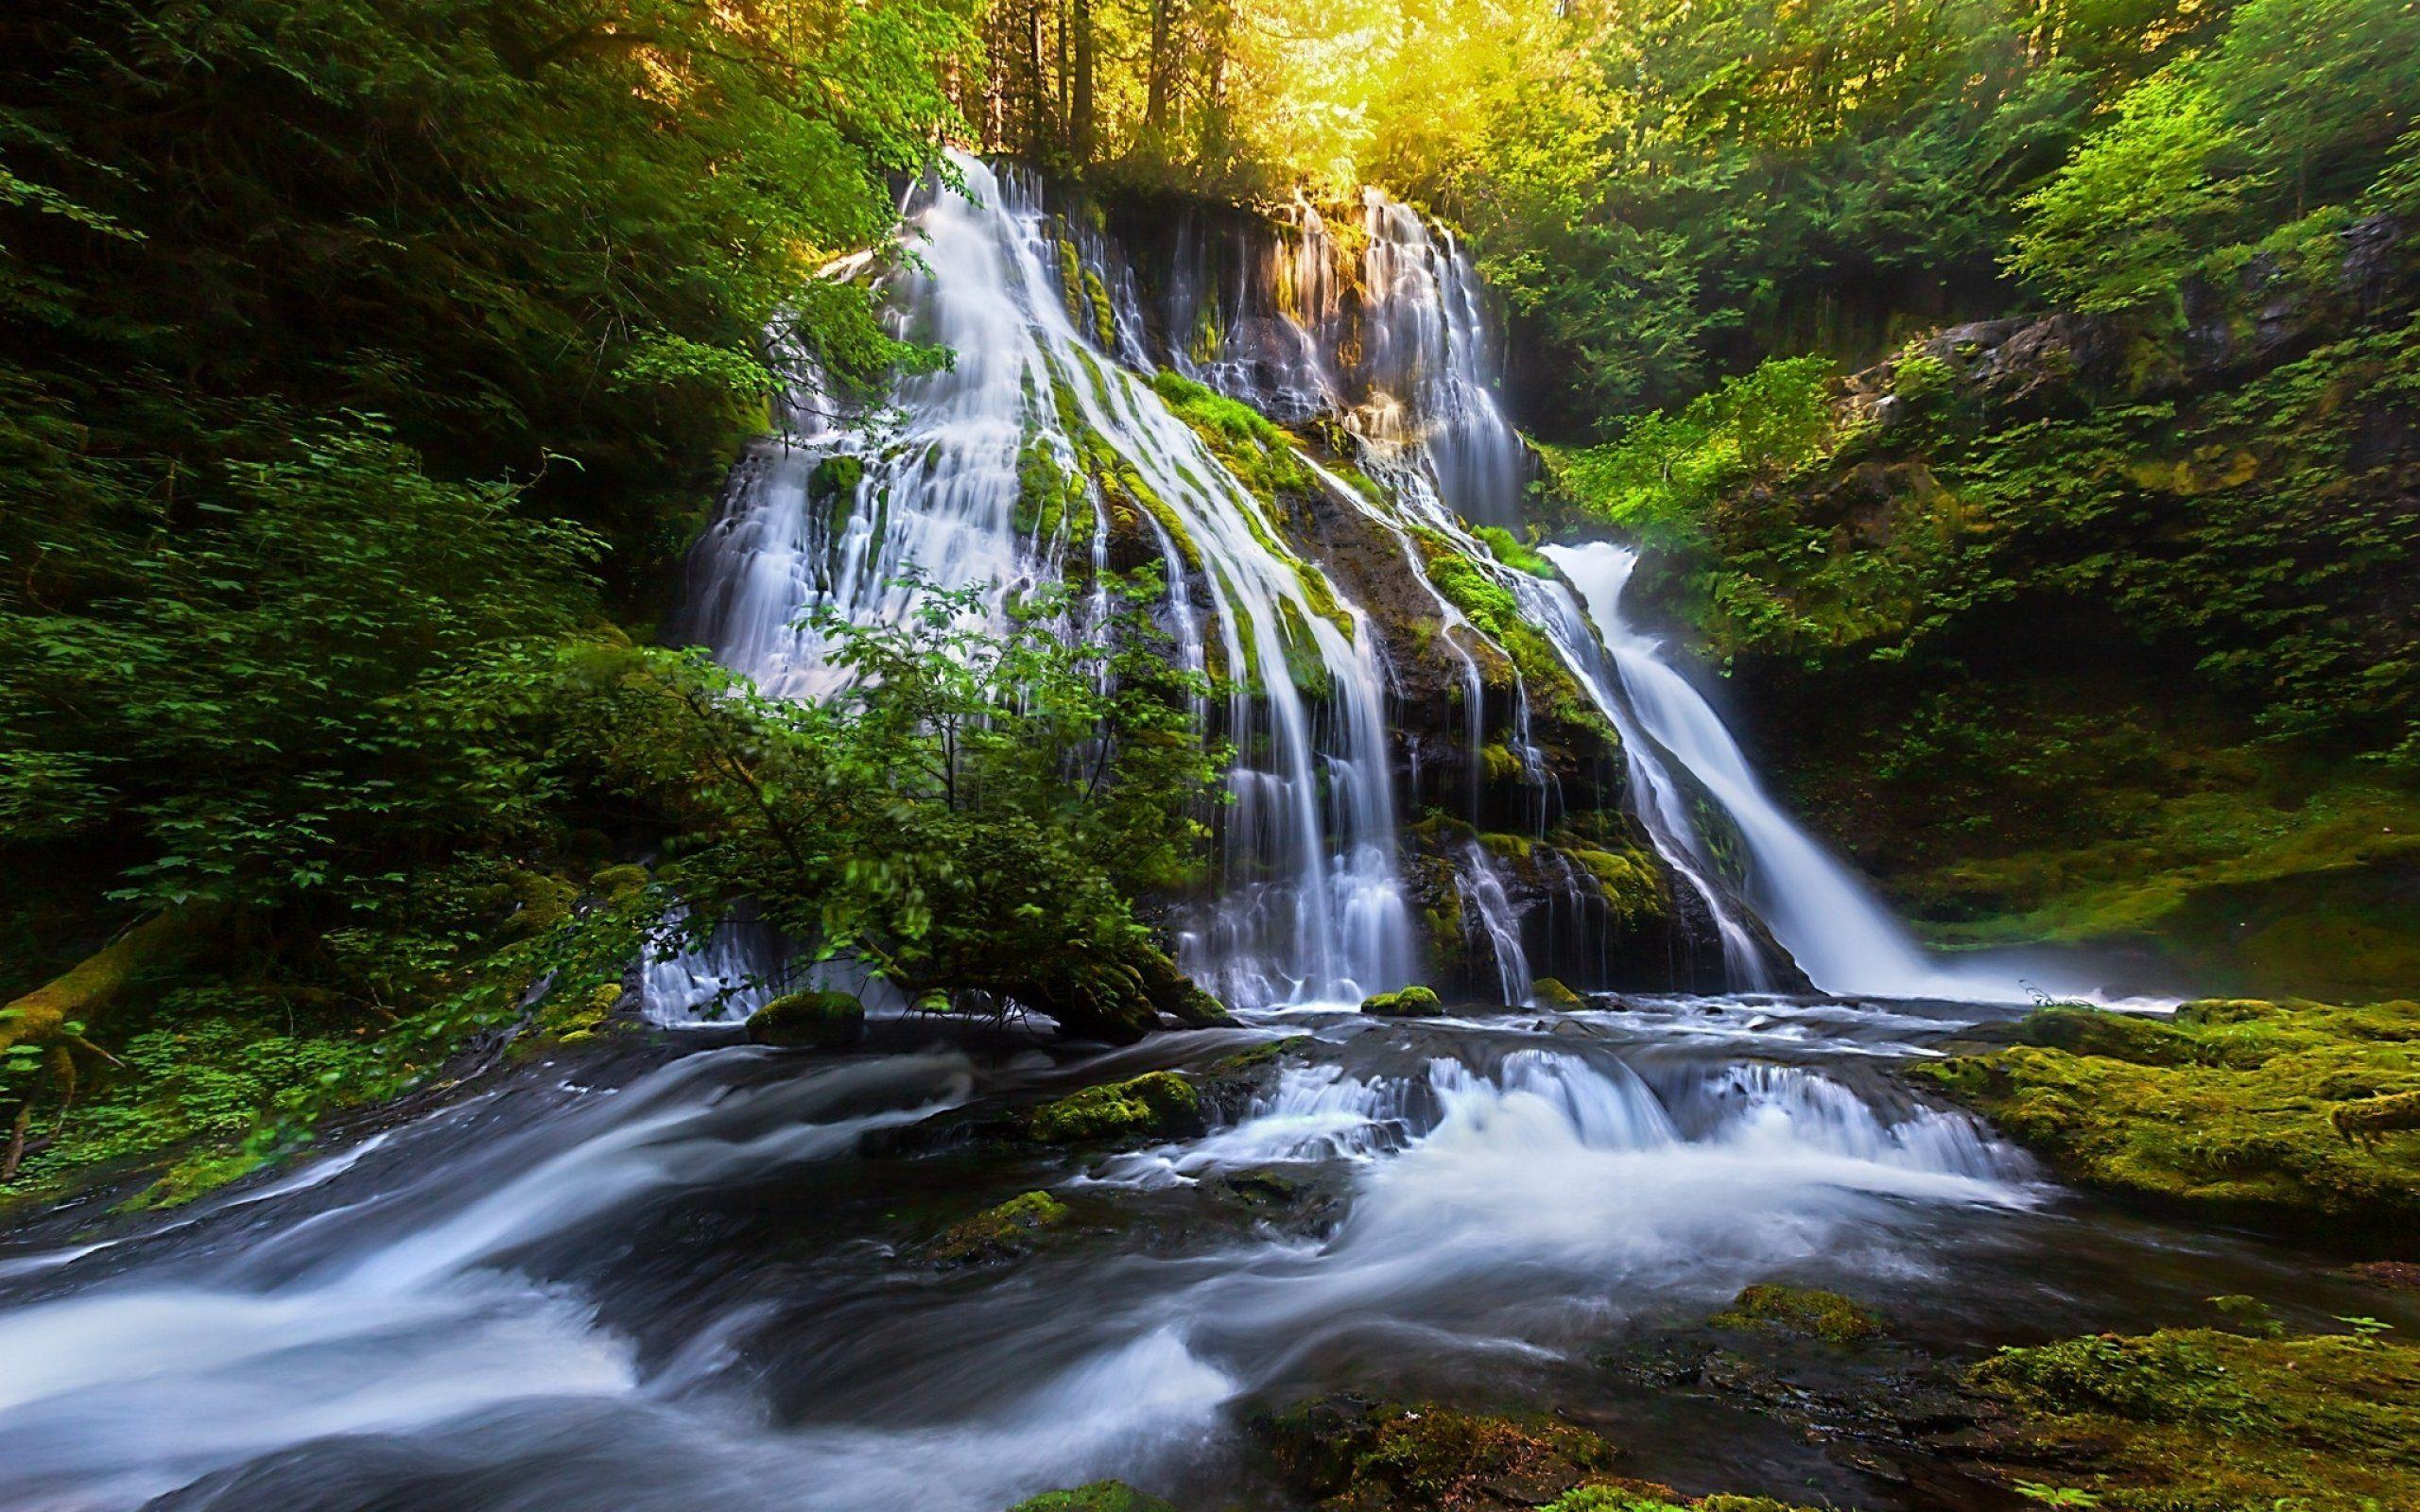 189-1896635_waterfall-river-landscape-nature-waterfalls-wallpaper-landscape-images.jpg